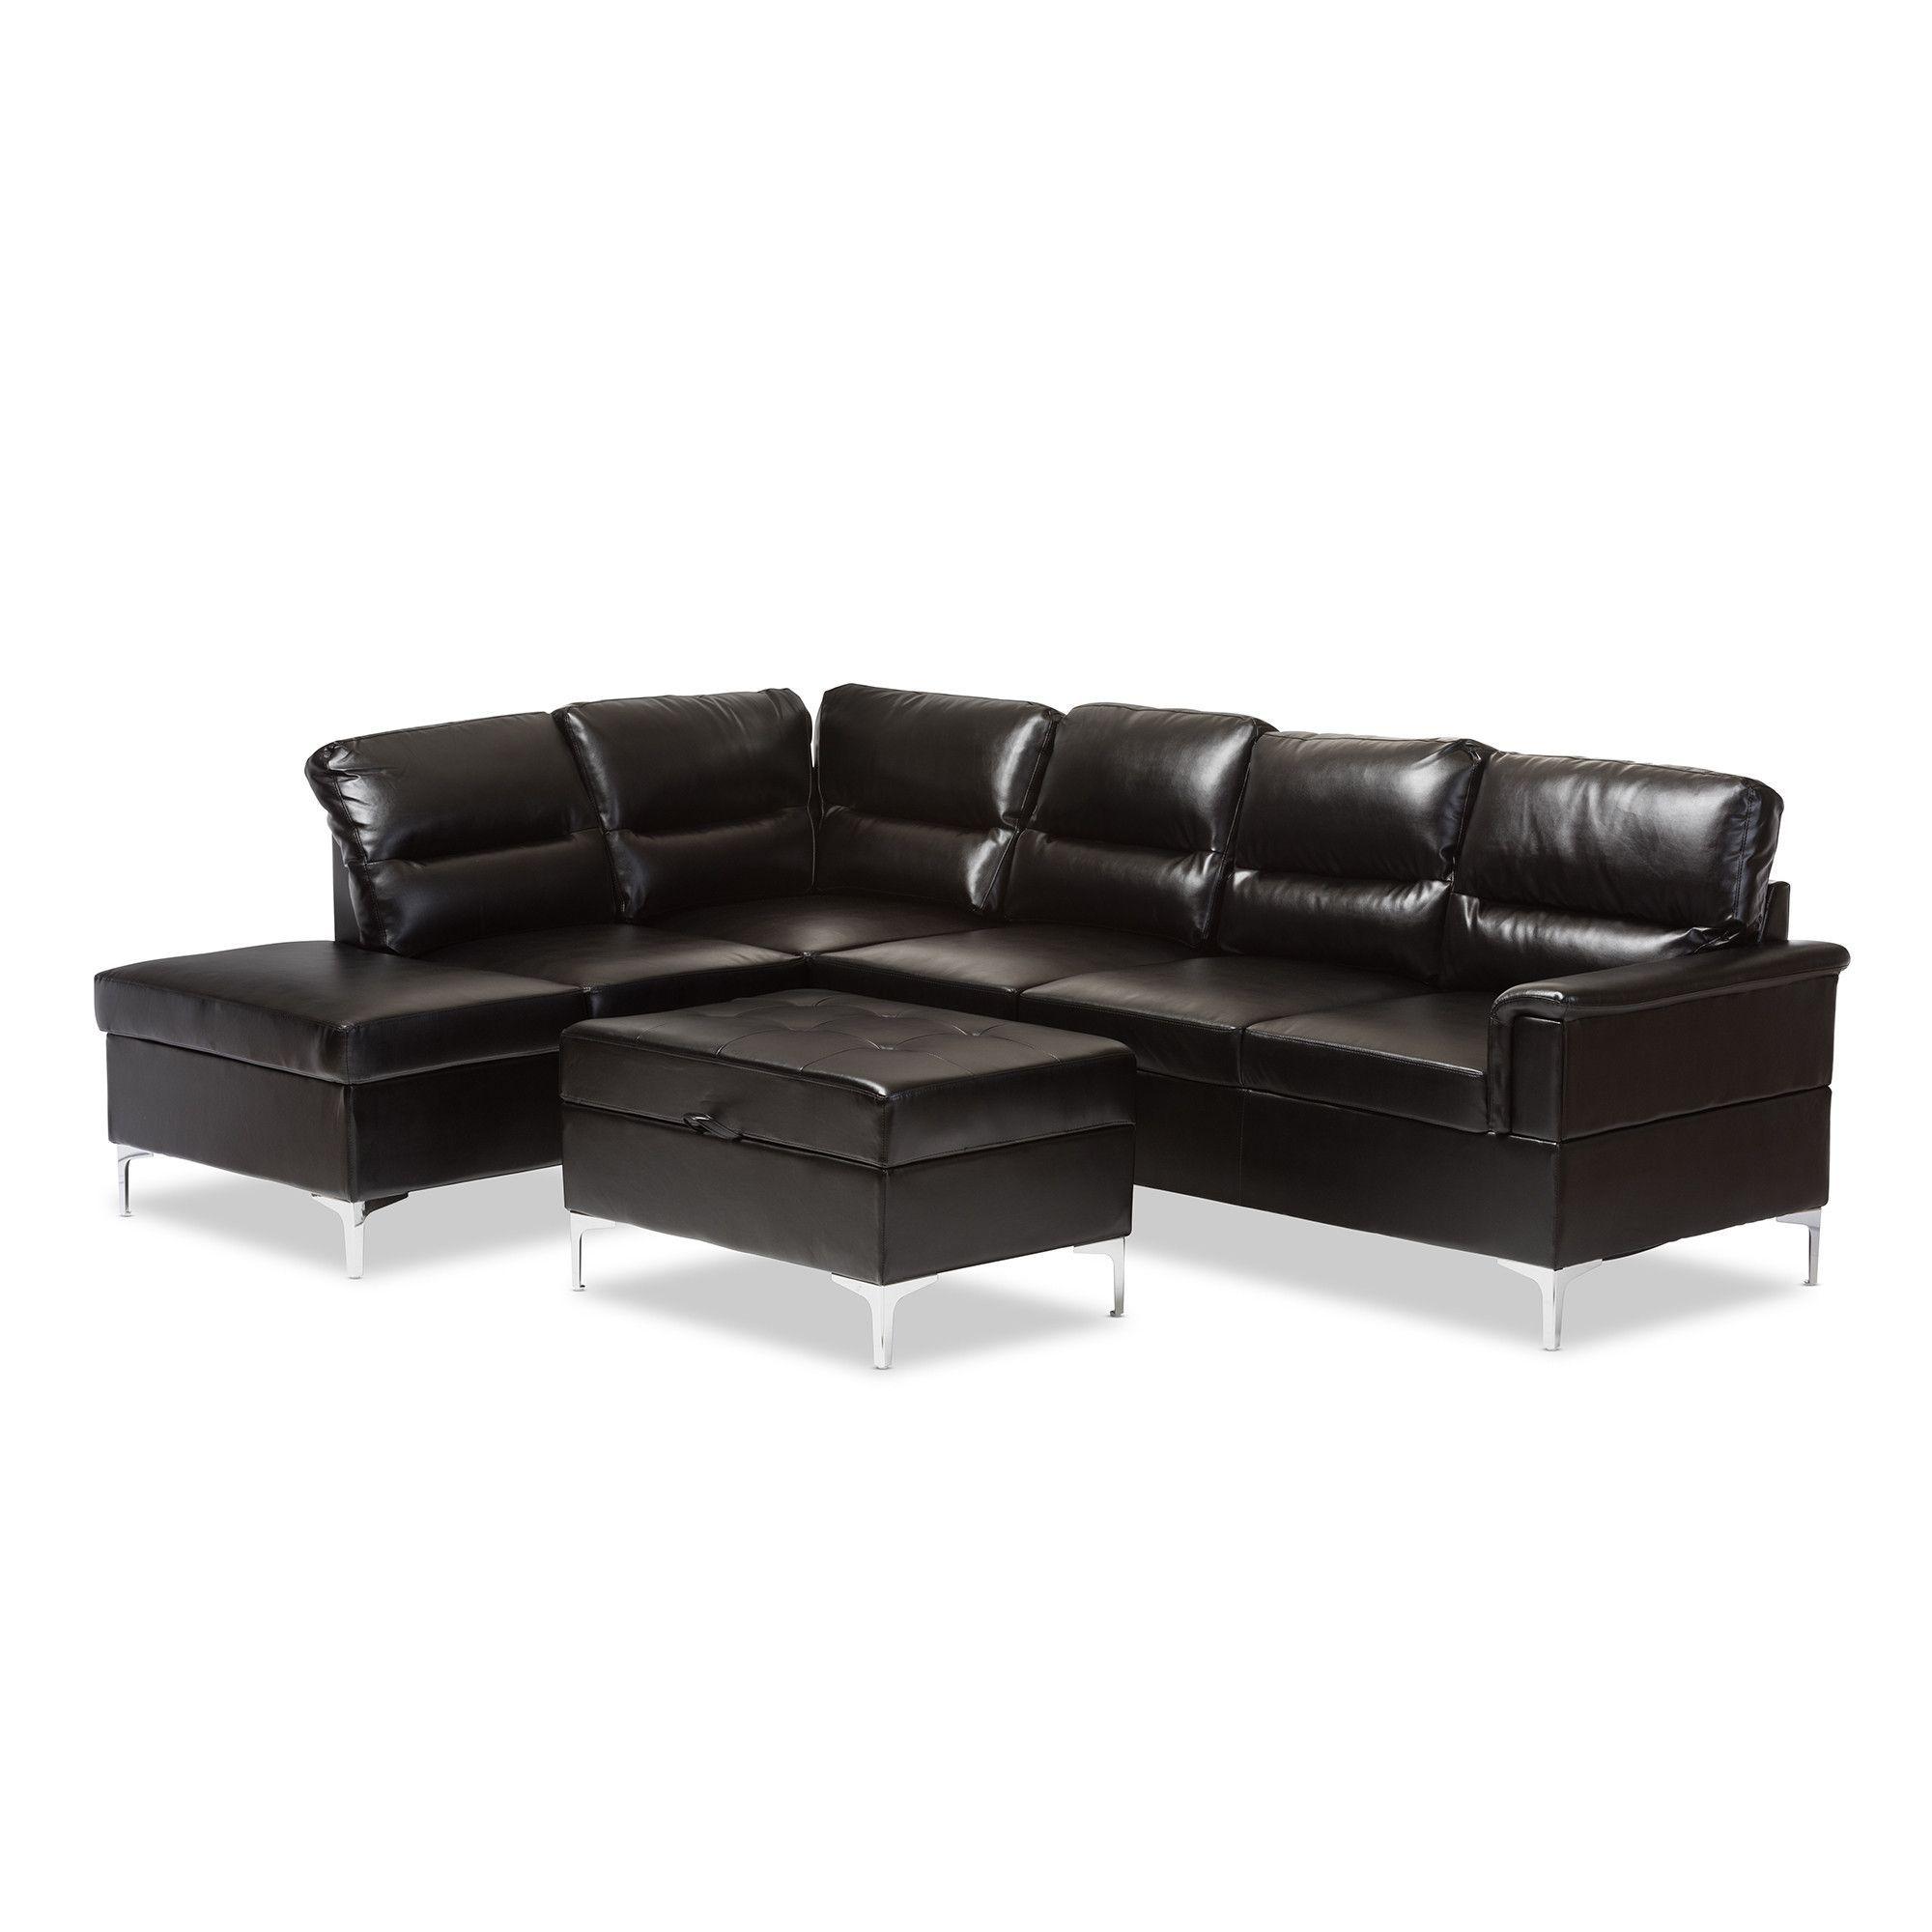 Kinsley Black Faux Leather 3 Piece Sectional Sofa Storage Ottoman